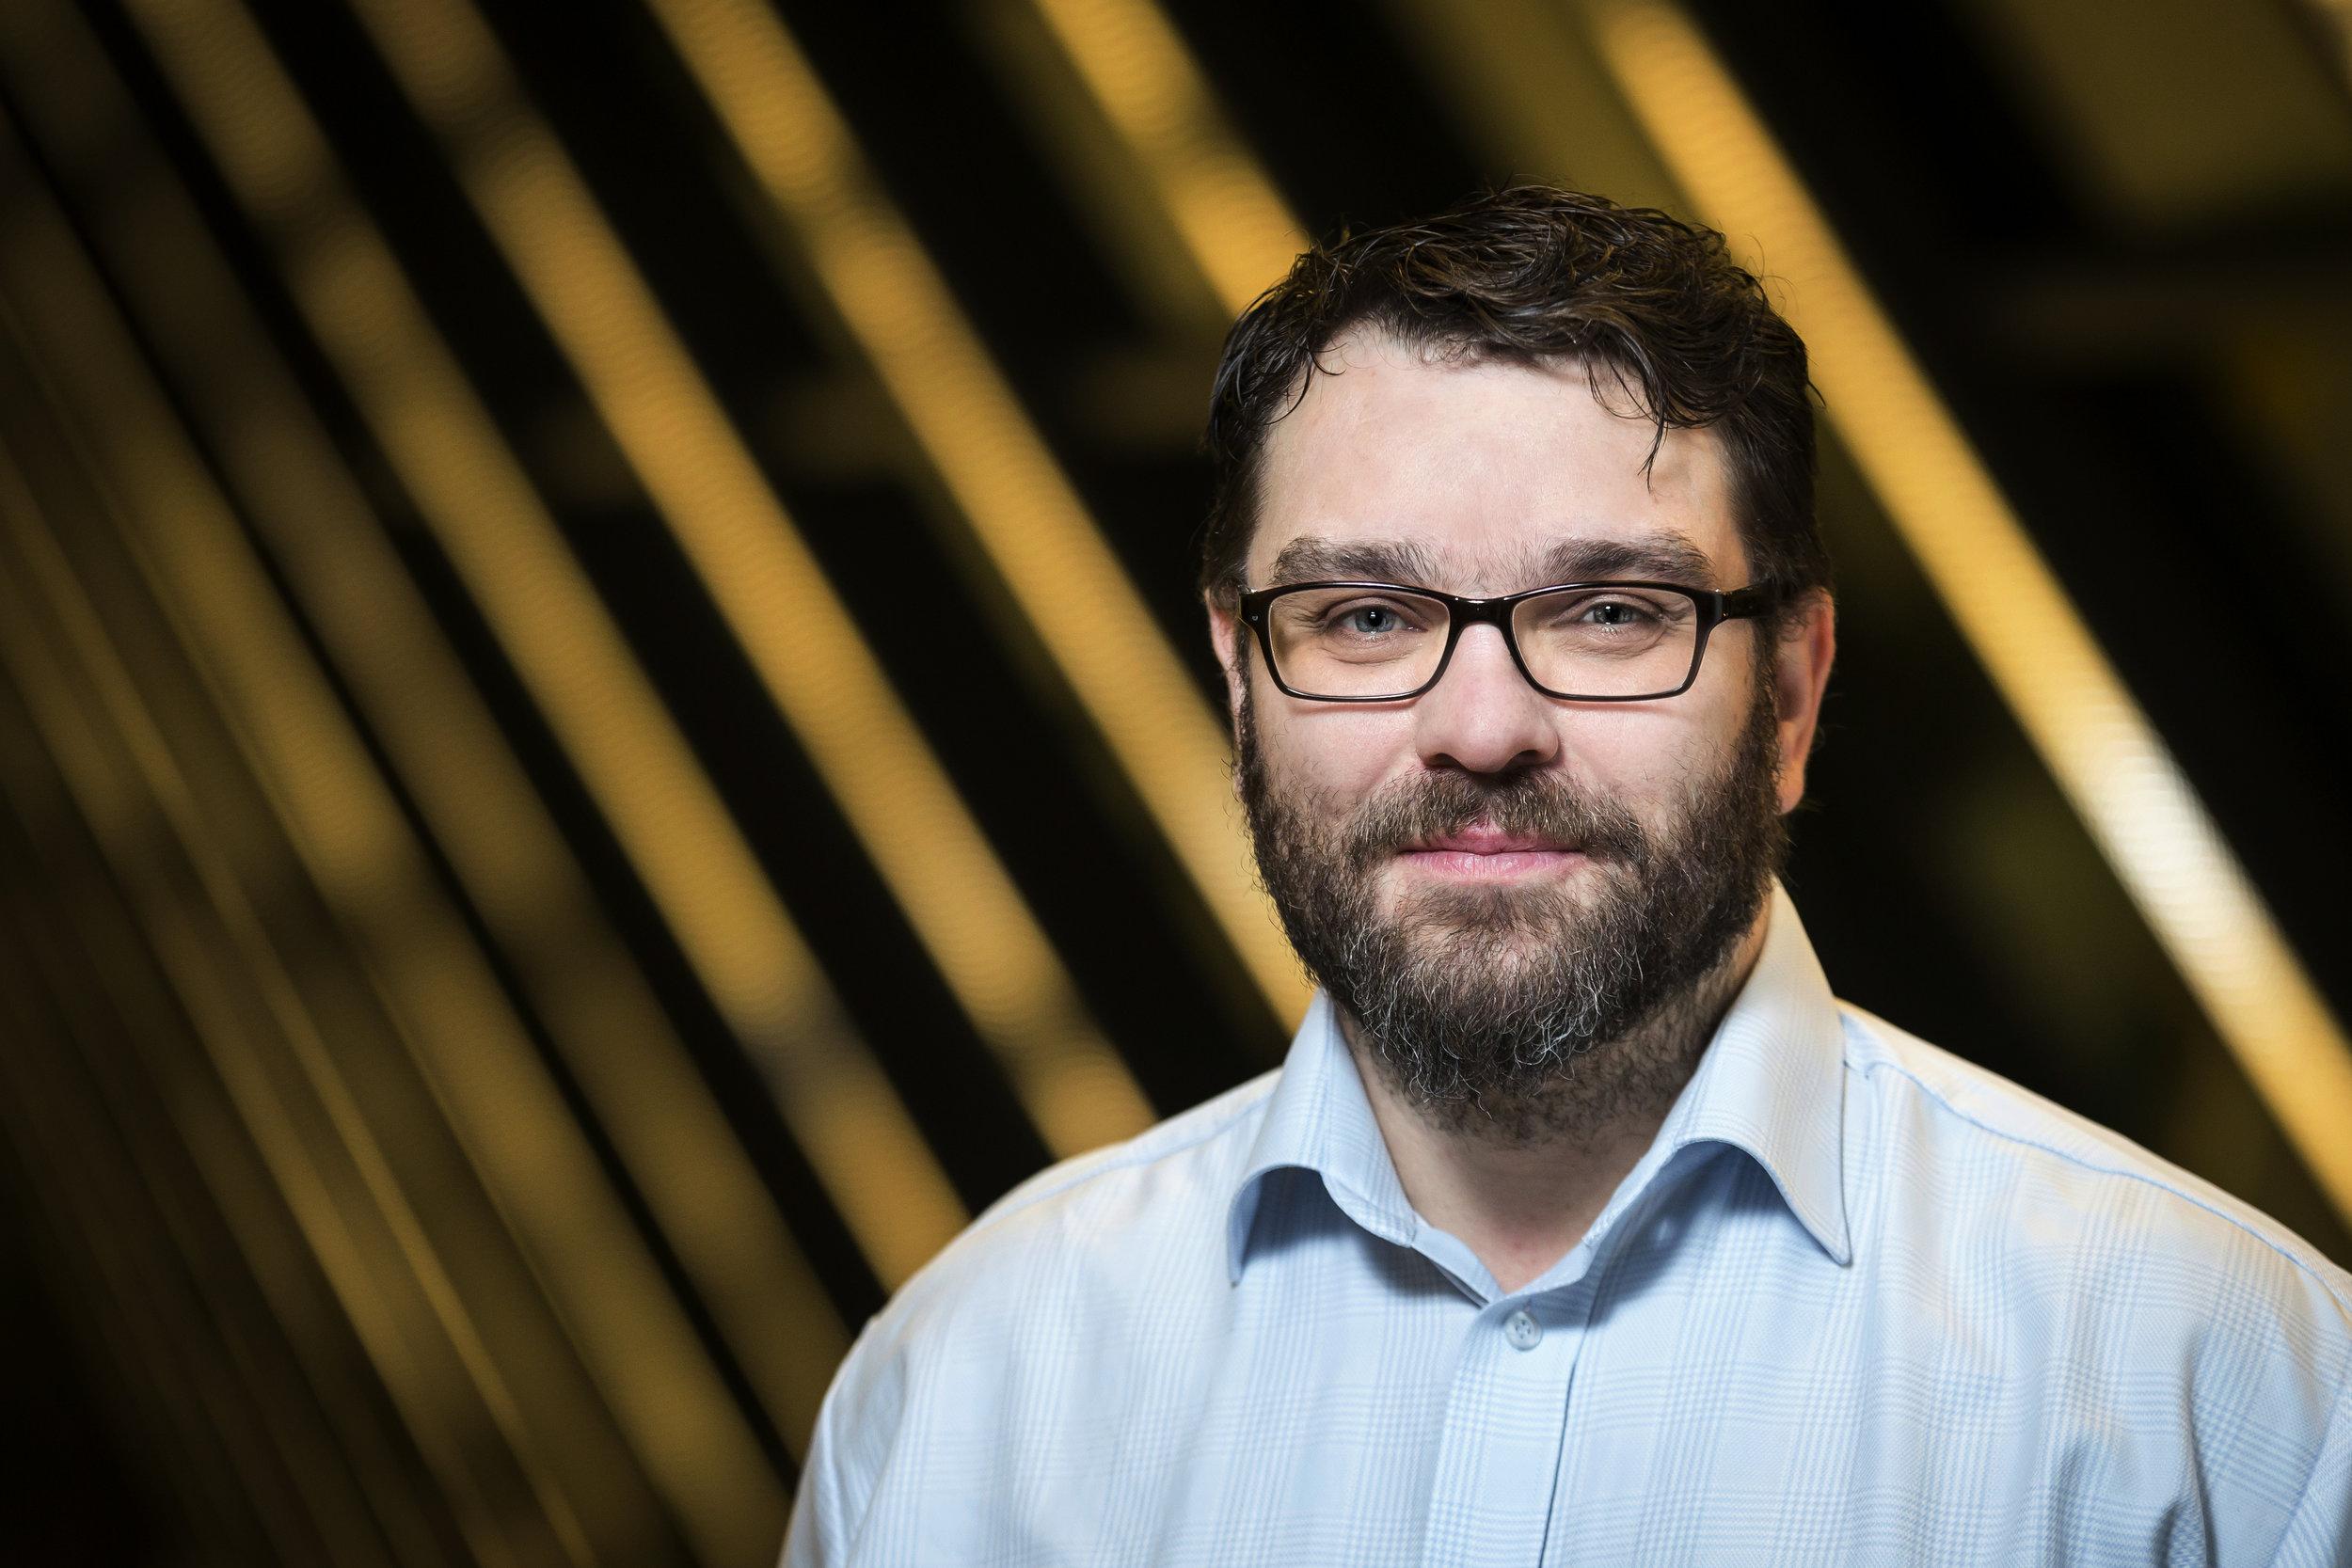 Magnús Haukur Ásgeirsson / Háskóli Íslands